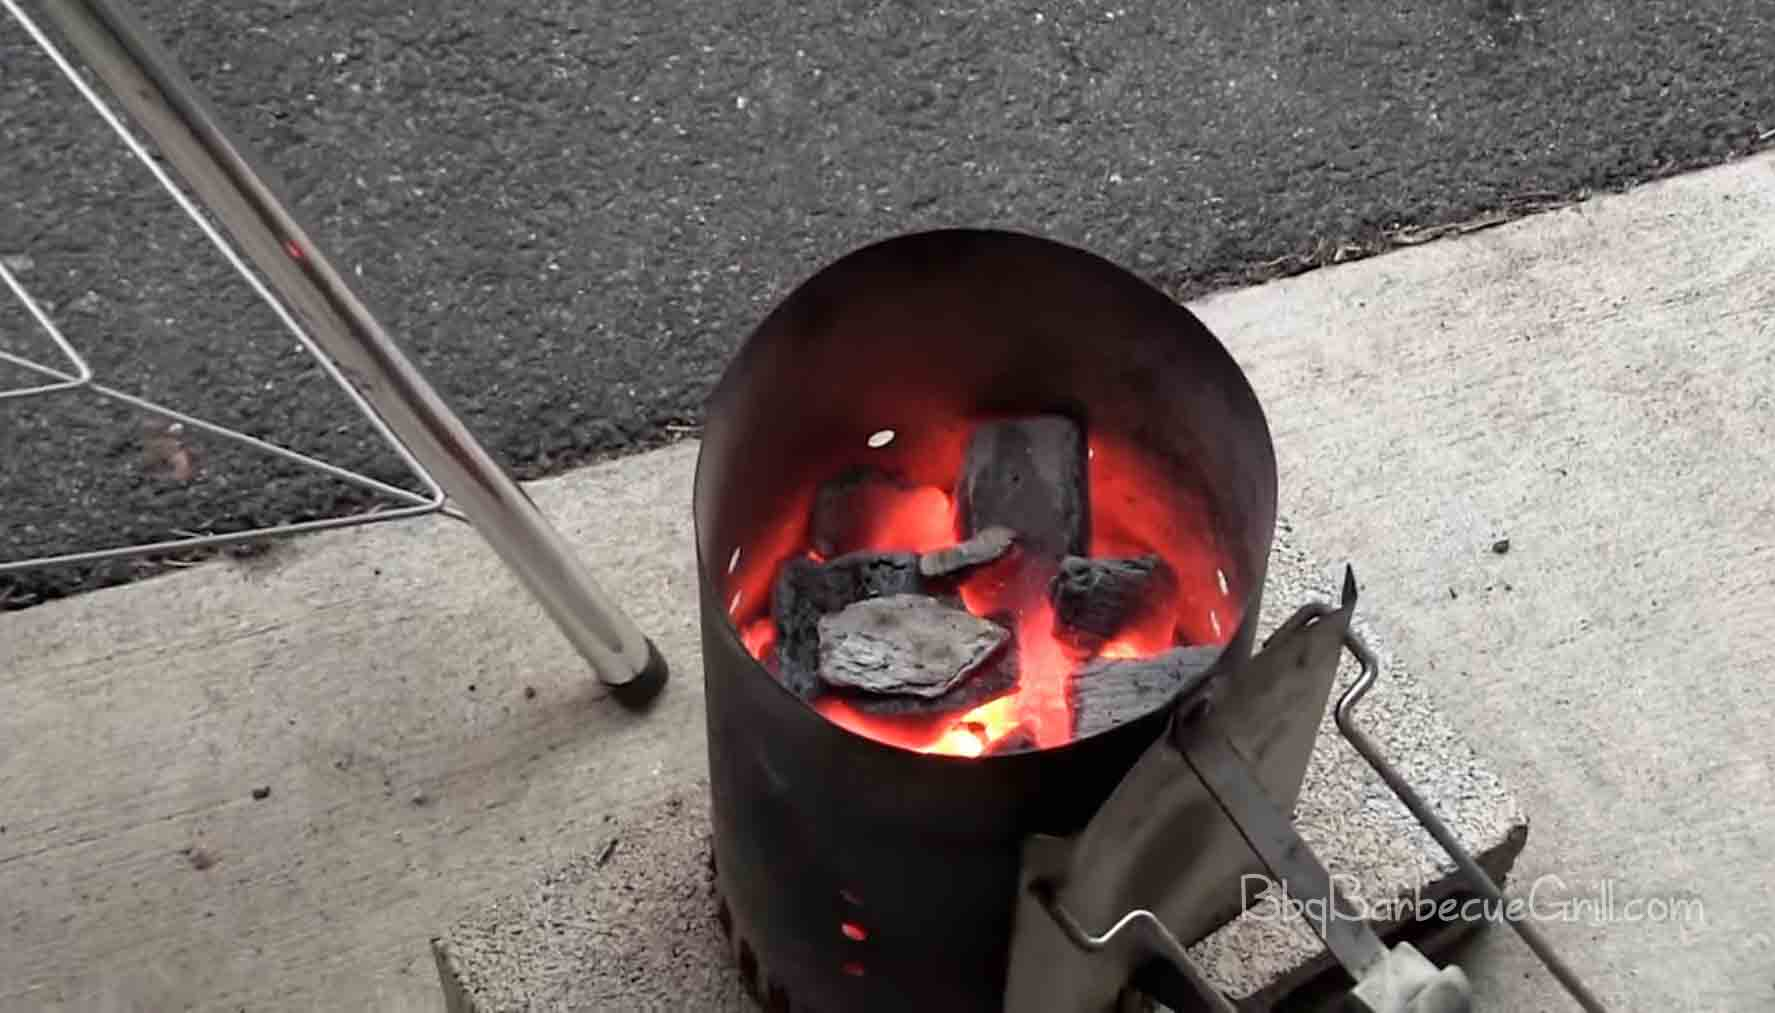 Best cast aluminum charcoal grill